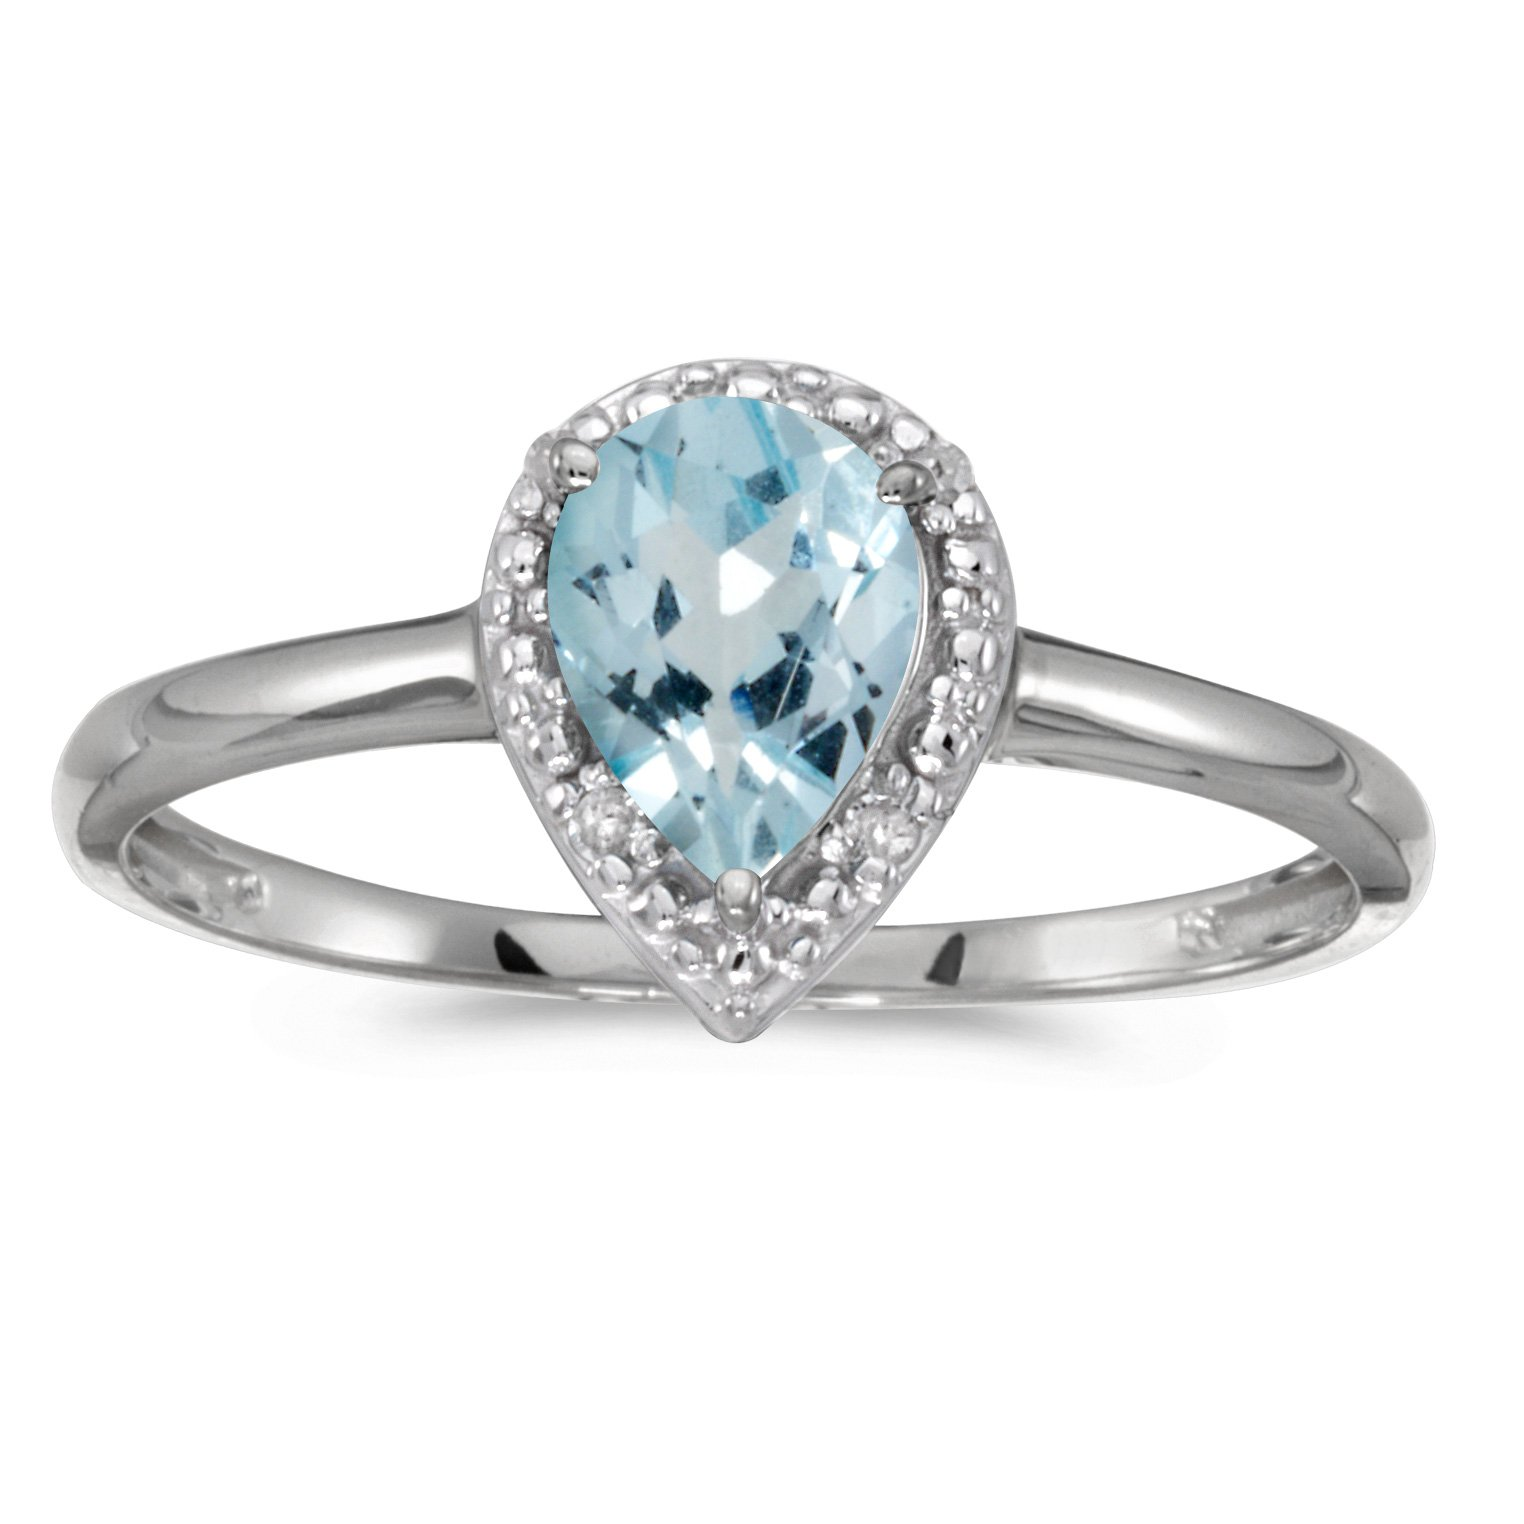 0.51 Carat ctw 14k Gold Pear Aqua Aquamarine Solitaire & Diamond Halo Engagement Promise Fashion Ring - White-gold, Size 5.5